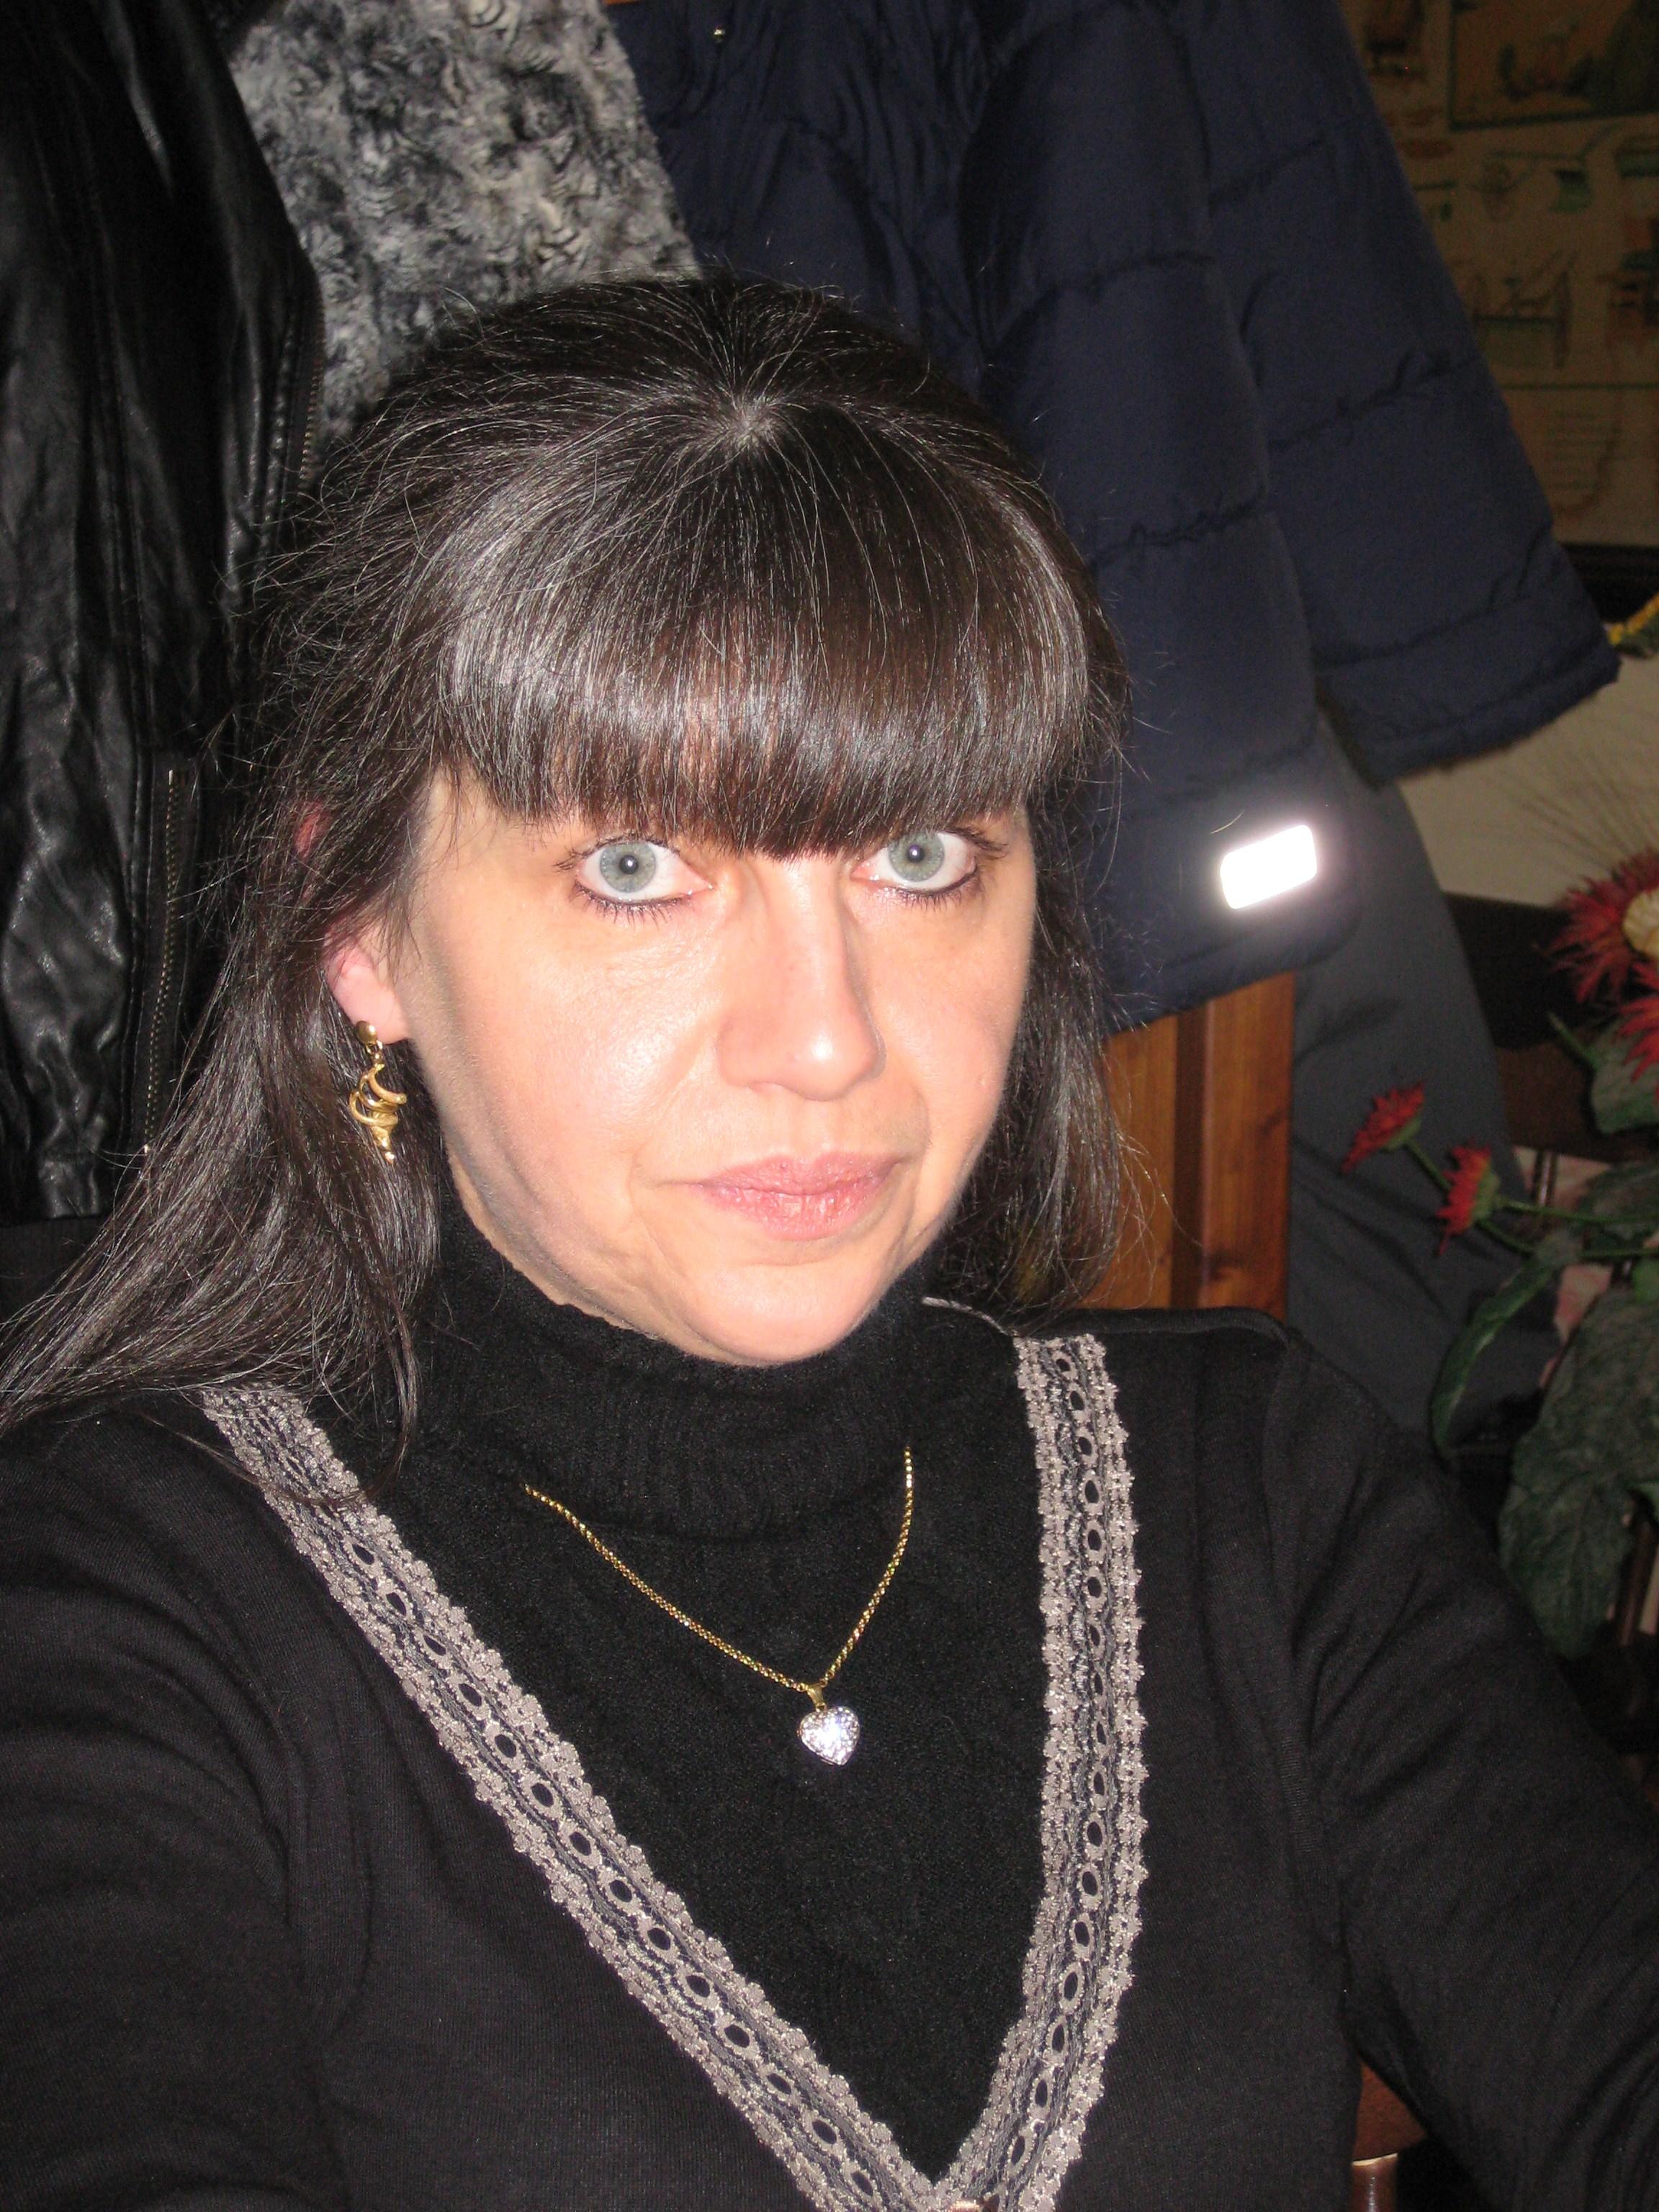 017-Denise-Fabiani---Trieste.jpg